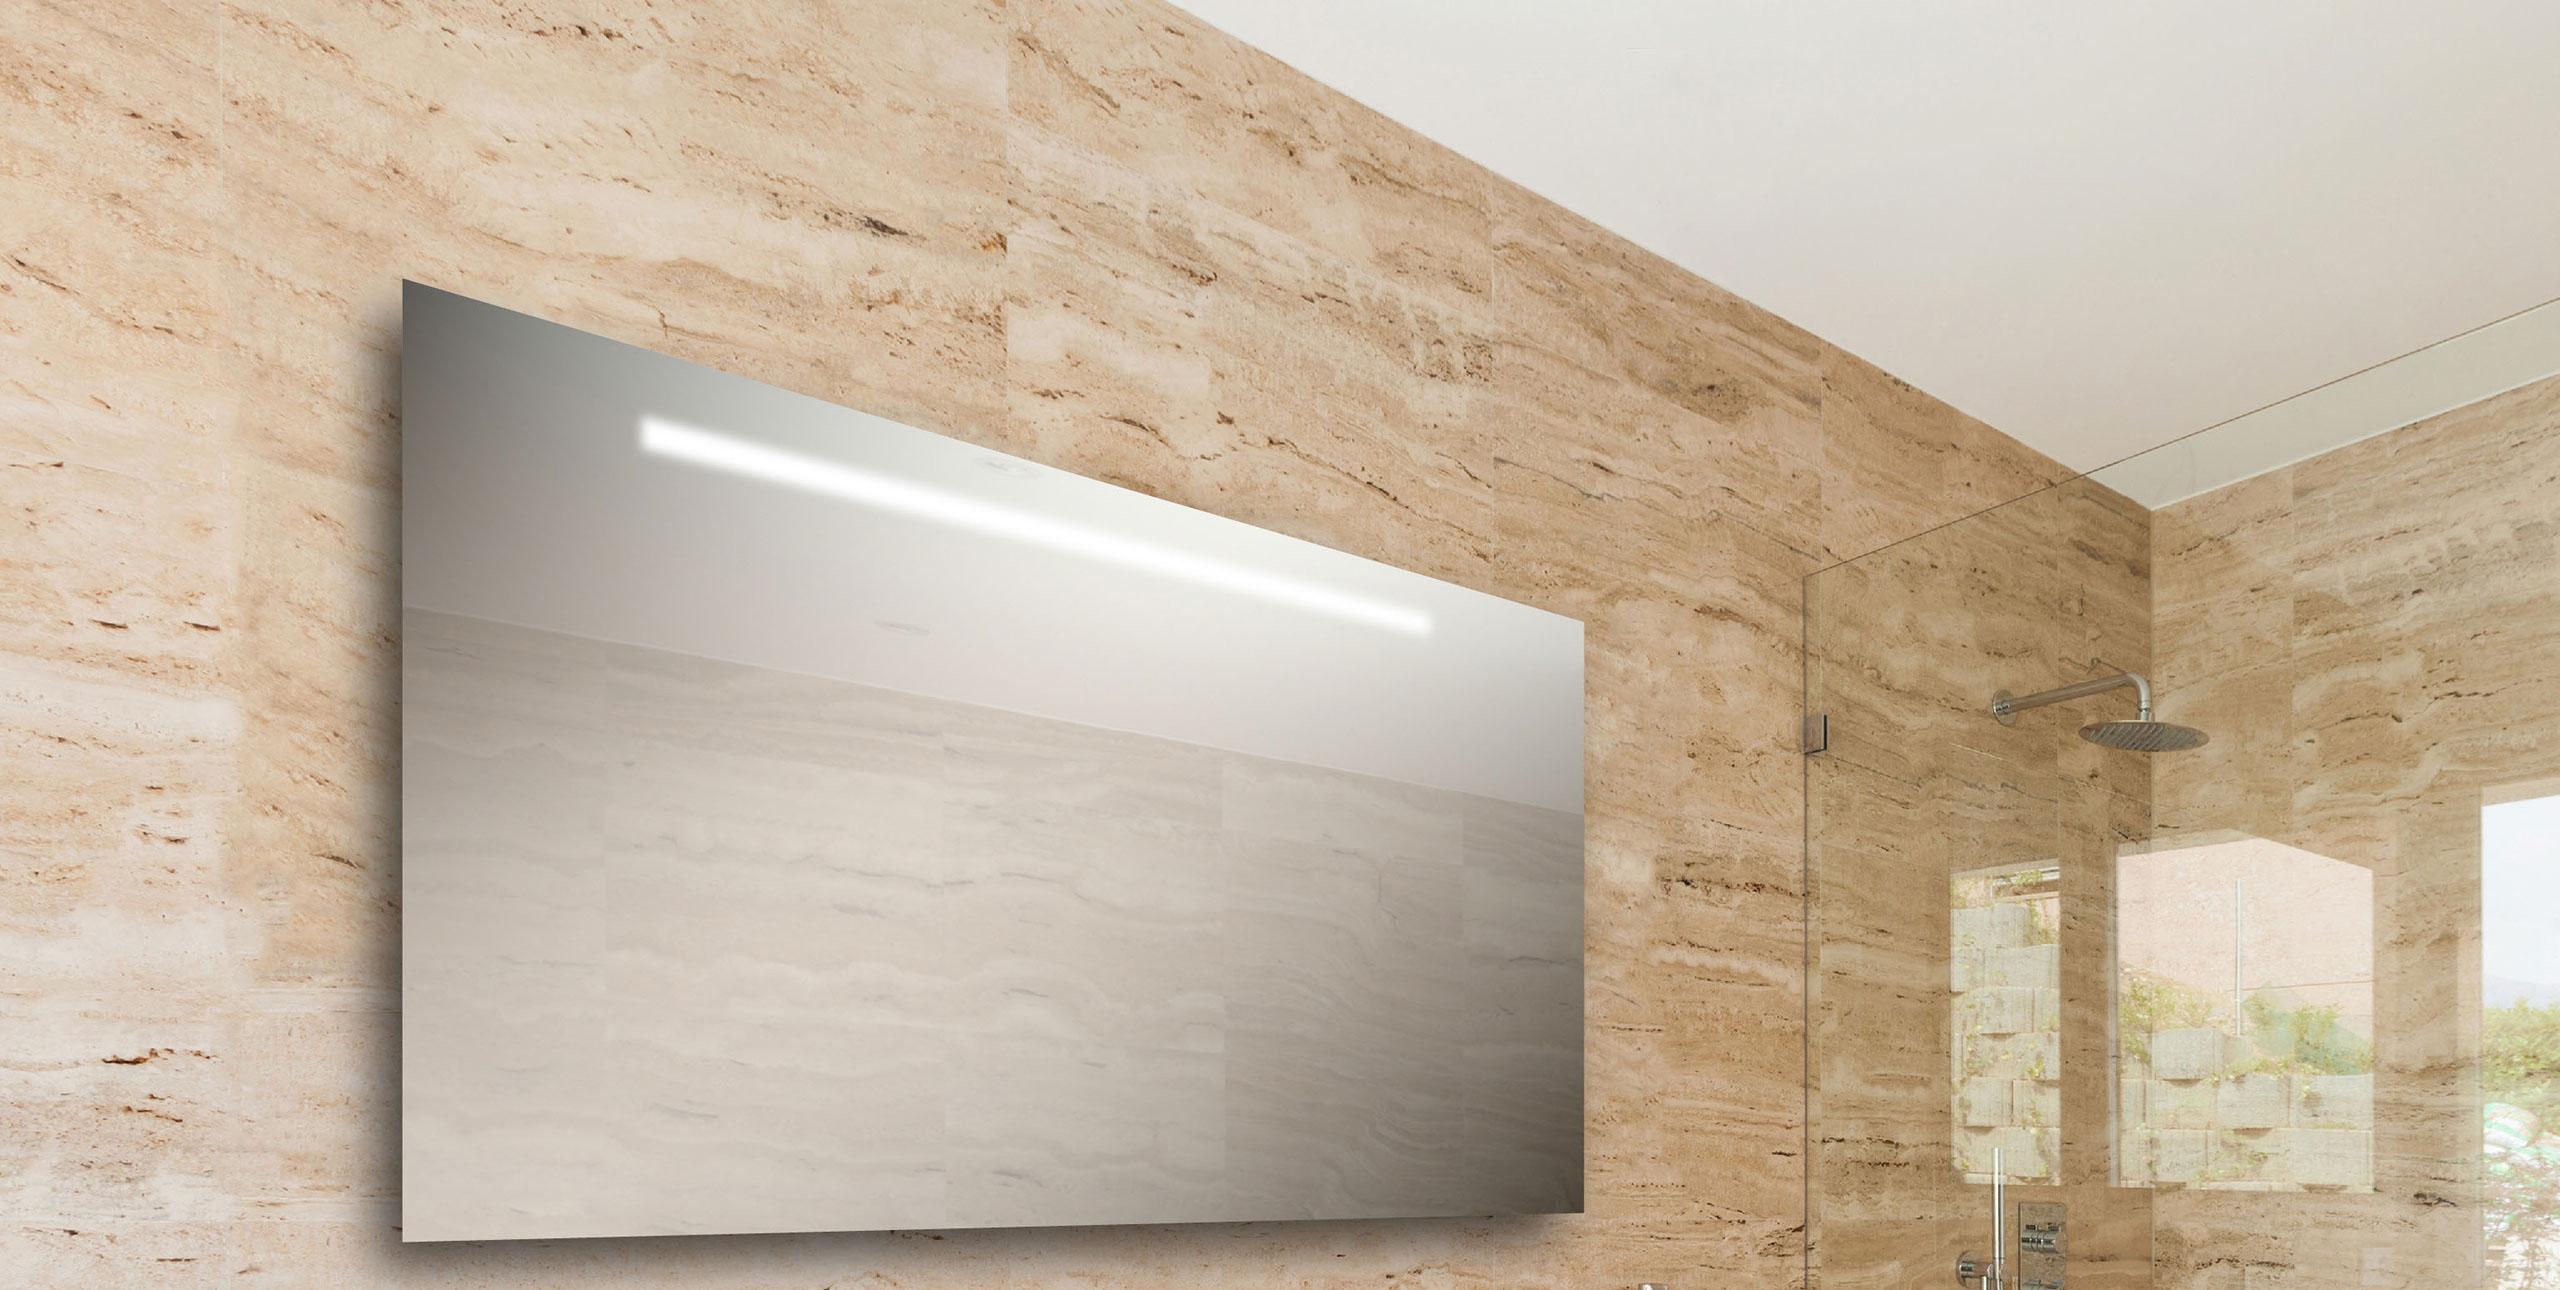 http://aqua-linea.be/images/spiegel%2060x120%20met%20licht%20miniatuur.jpg?crc=4139967493